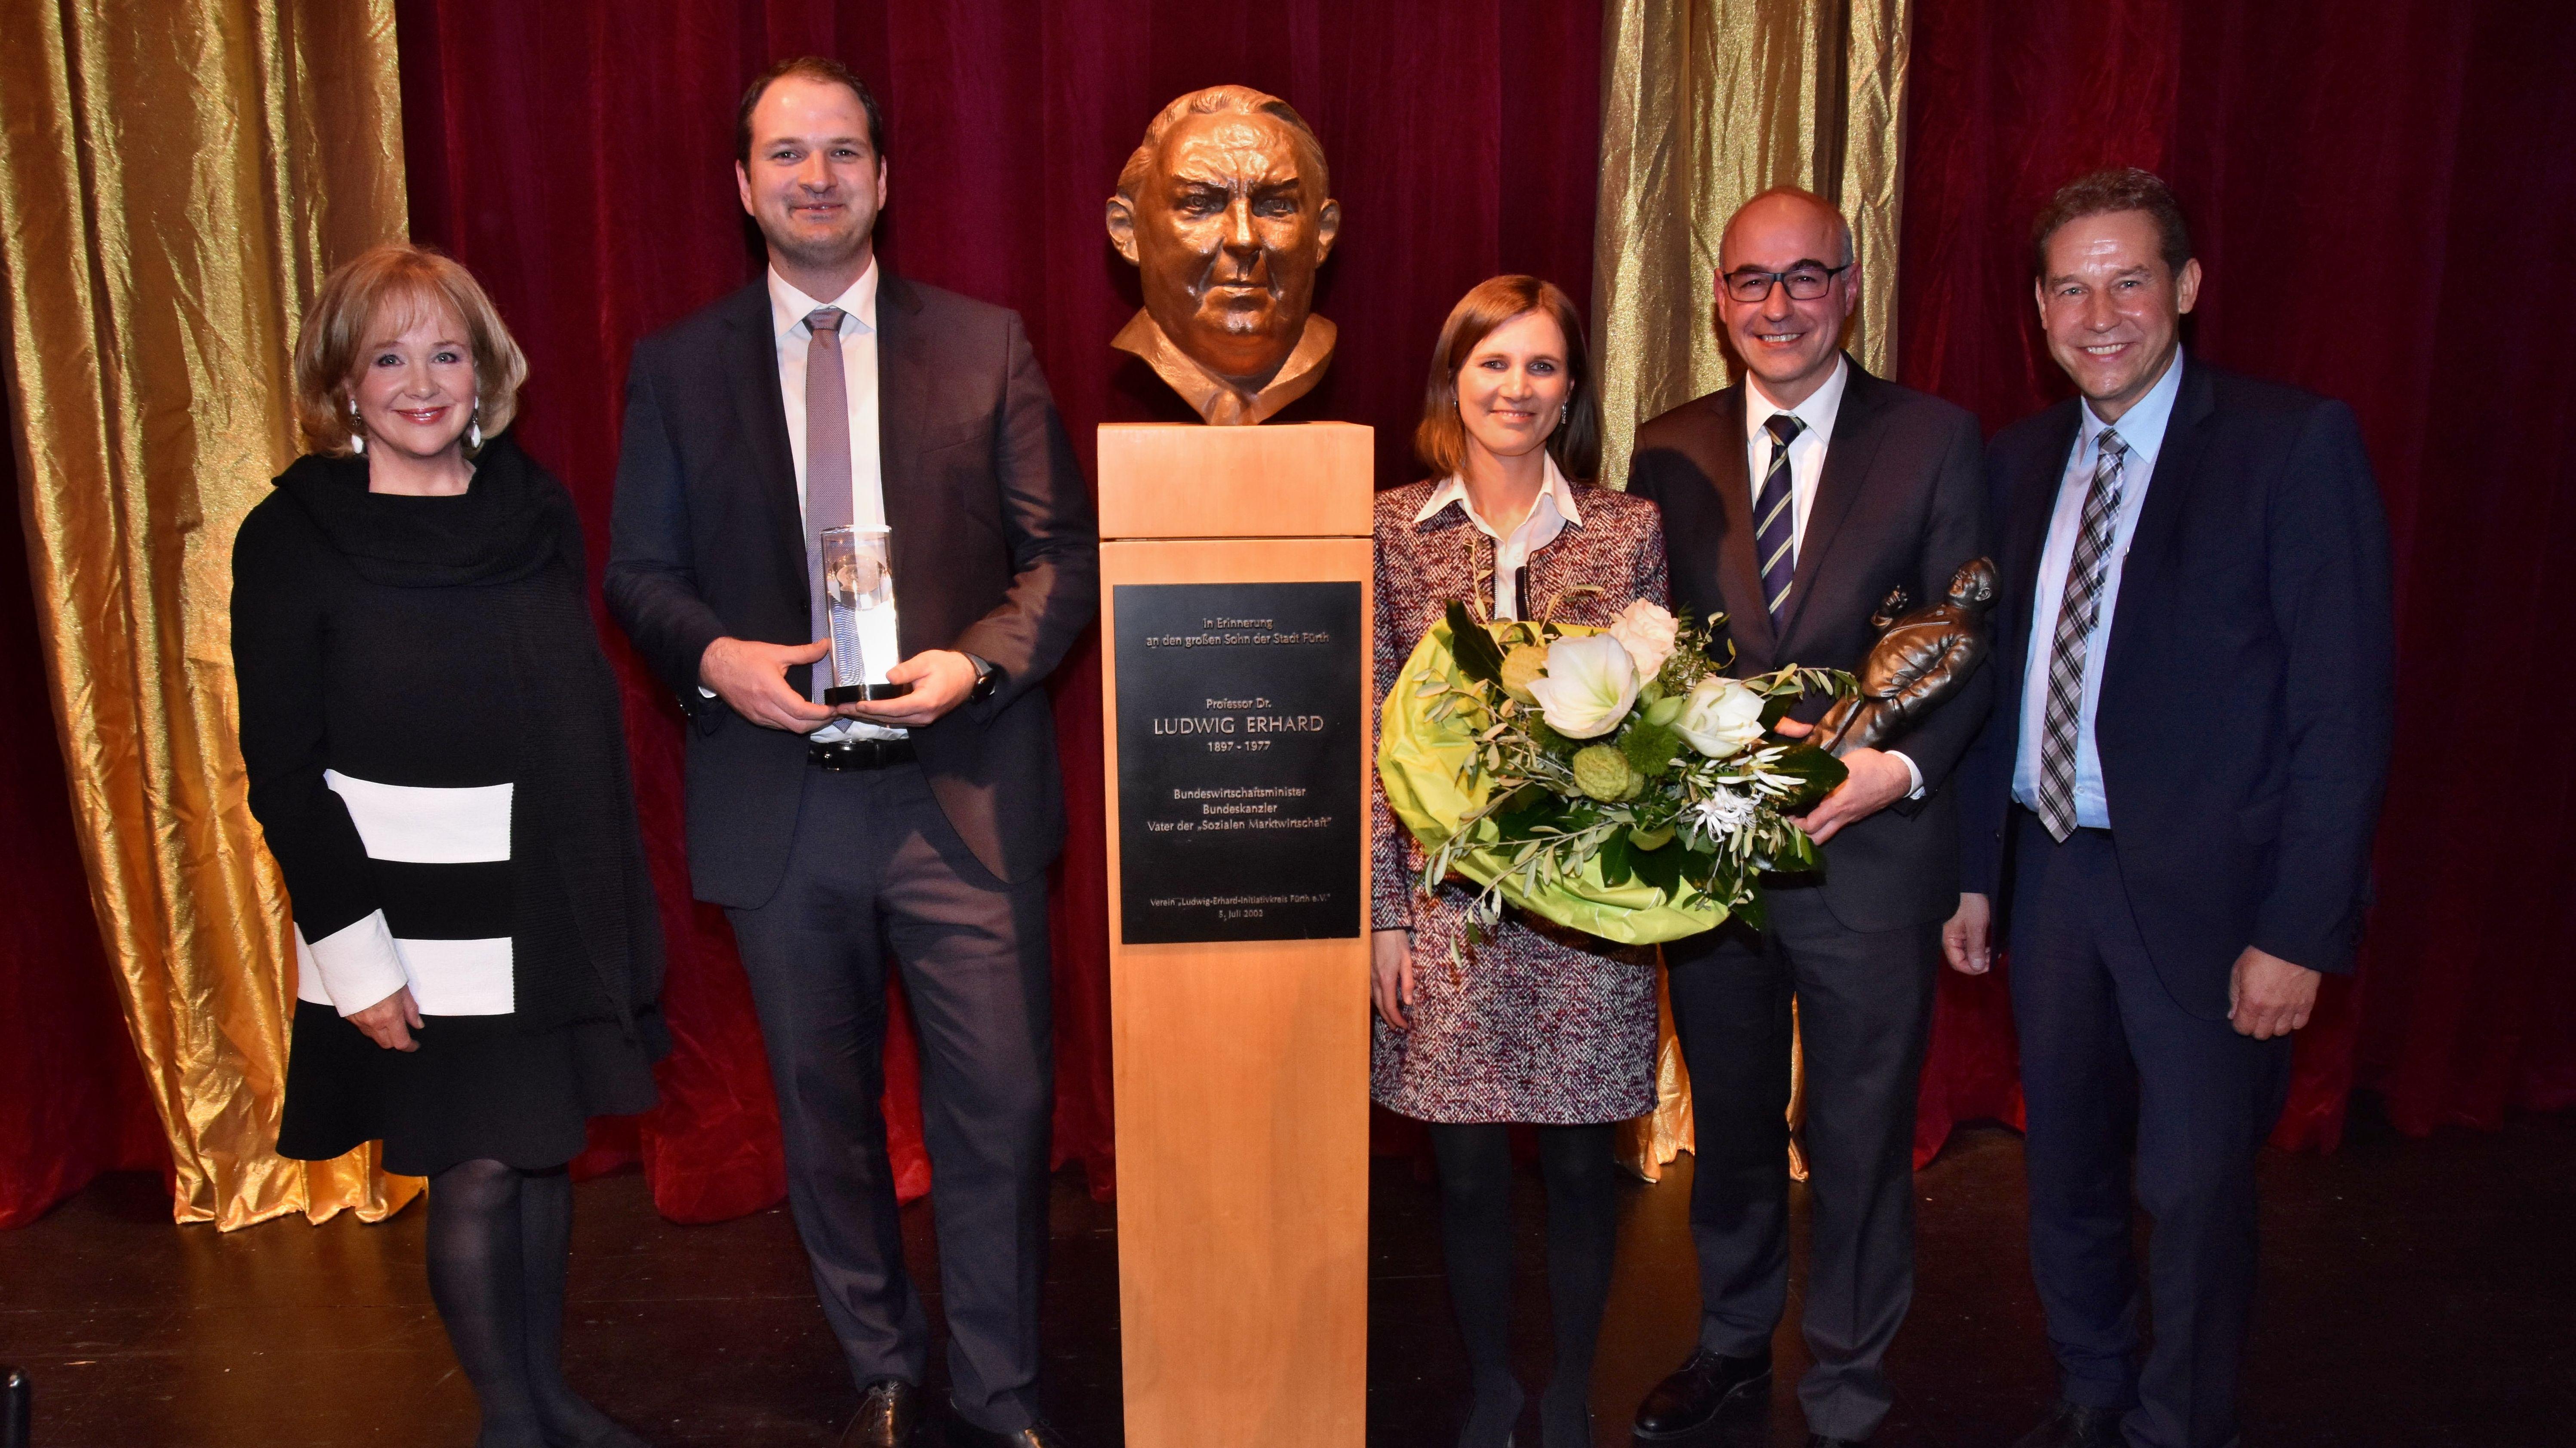 Verleihung des Ludwig-Erhard-Preises 2019 in Fürth